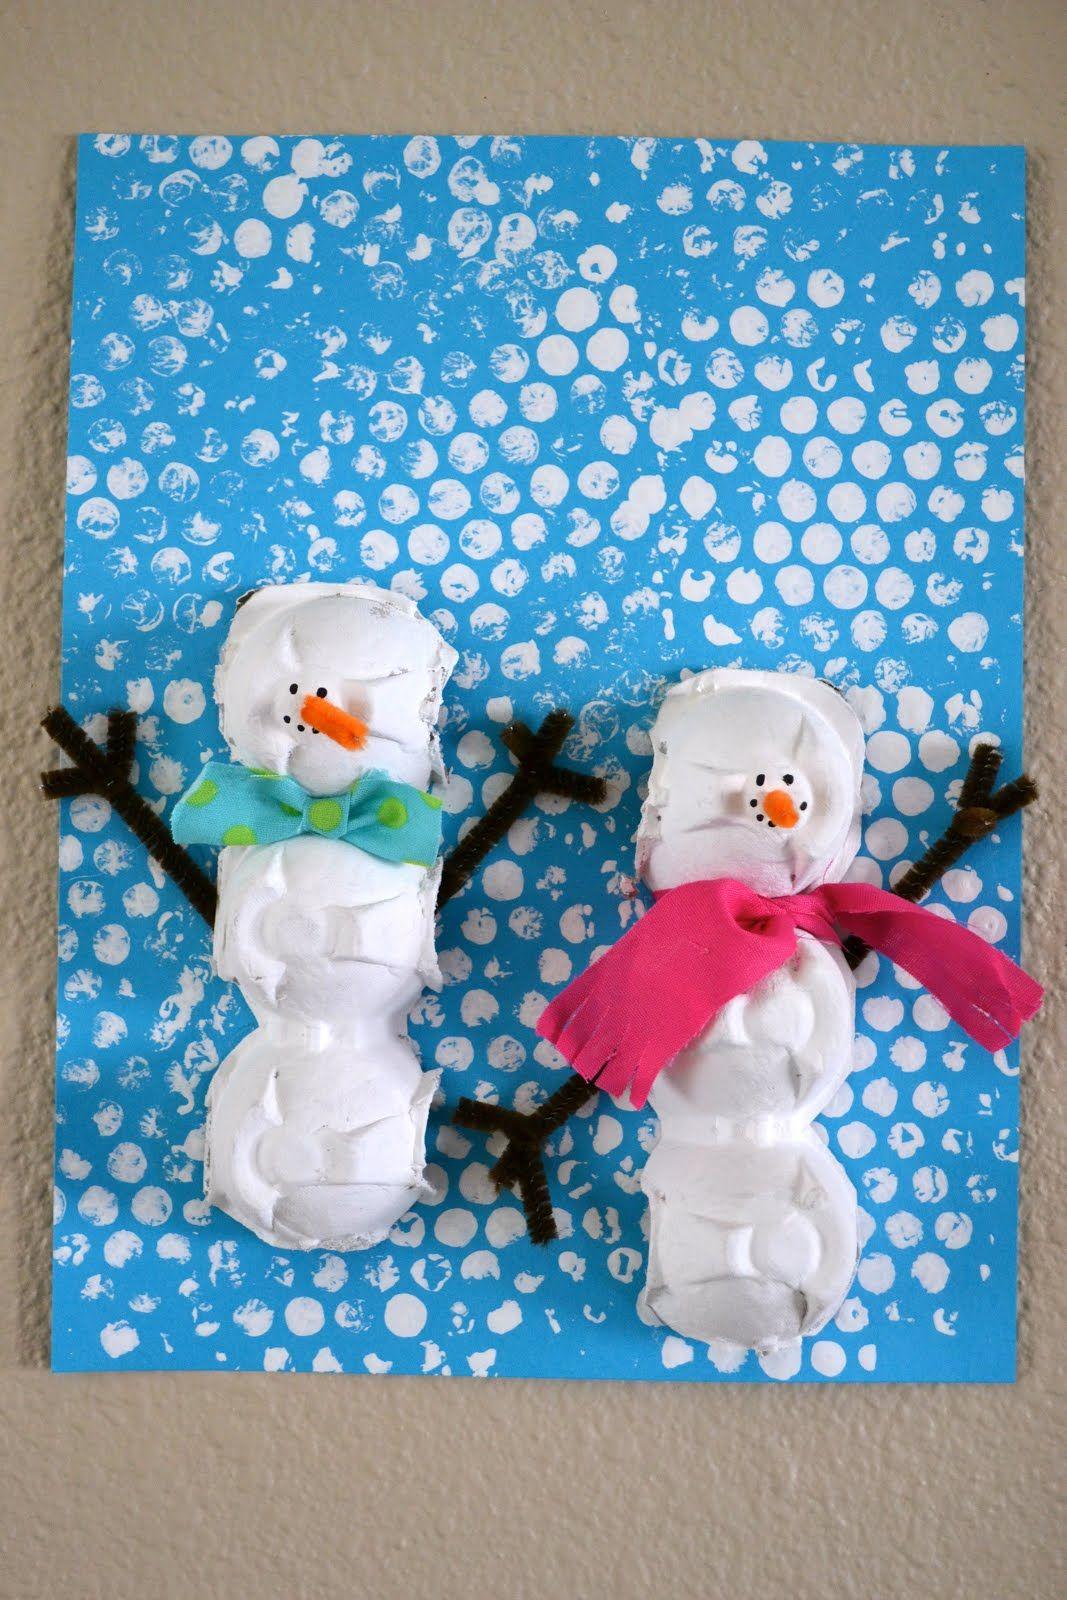 snowman craft made with egg cartin kids craft winter pinterest schneemann basteln winter. Black Bedroom Furniture Sets. Home Design Ideas